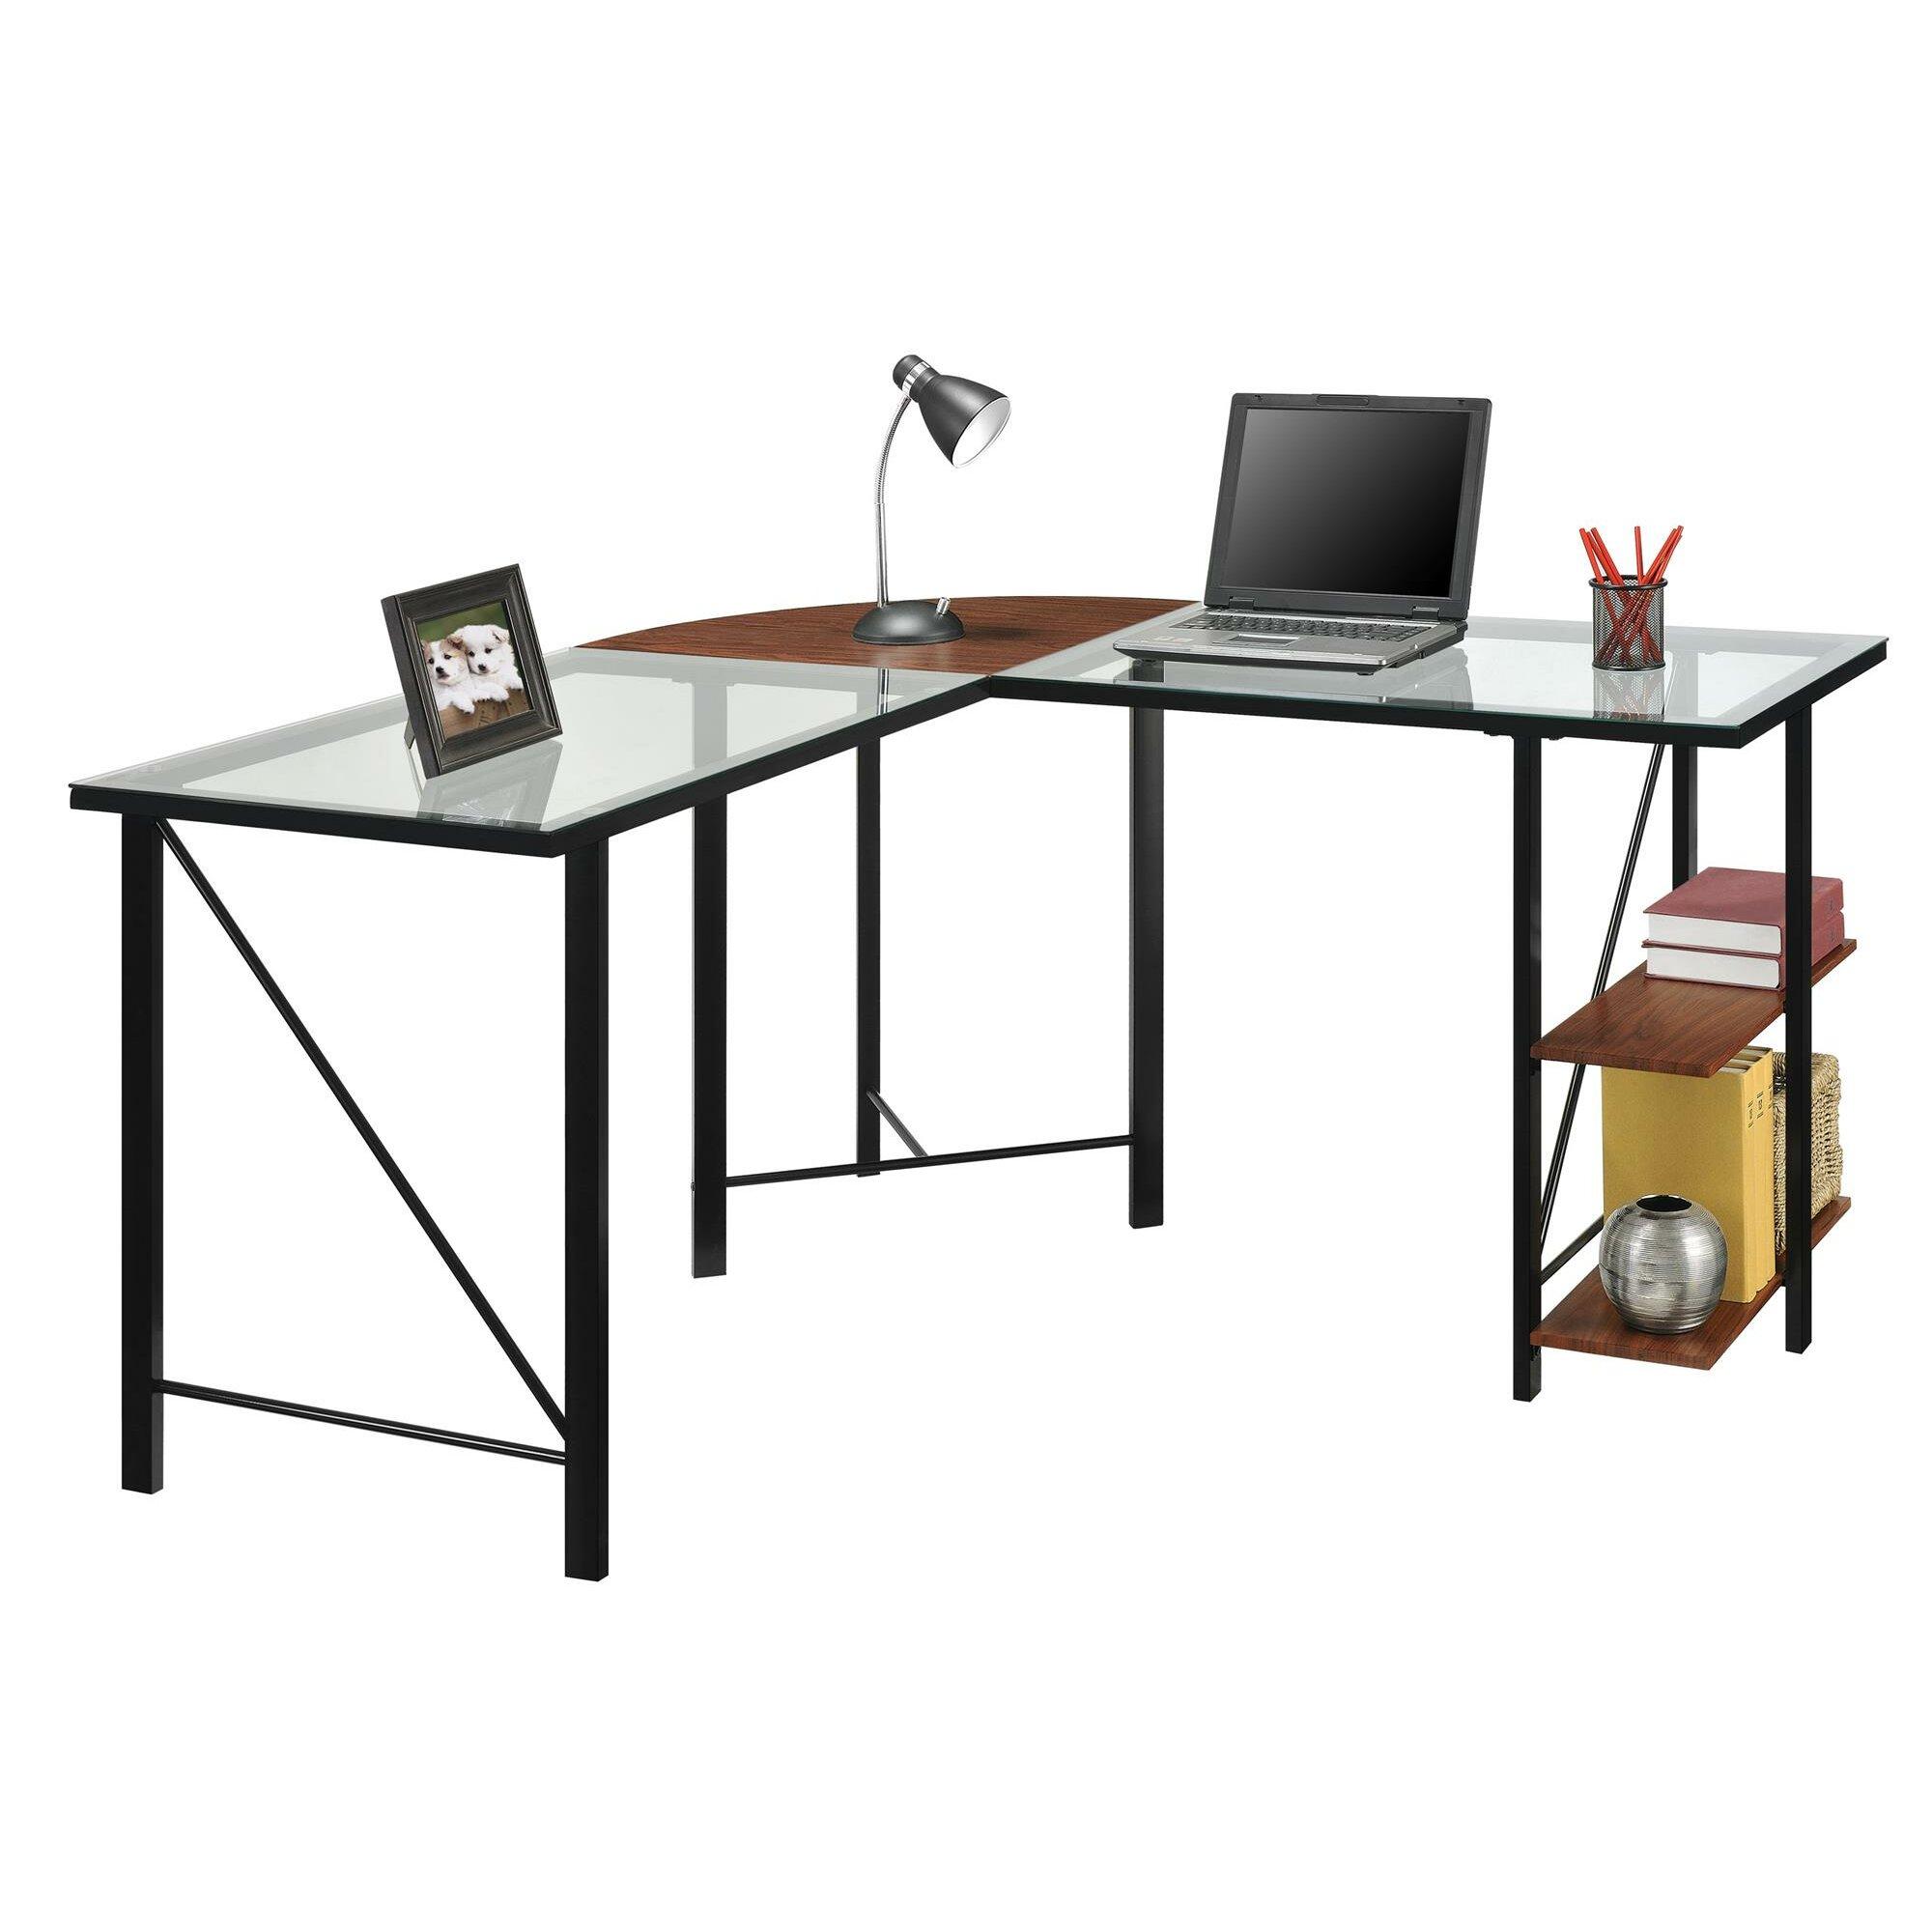 #9C792F Mercury Row Pando L Shape Writing Desk & Reviews Wayfair with 2000x2000 px of Brand New Floor Writing Desk 20002000 pic @ avoidforclosure.info